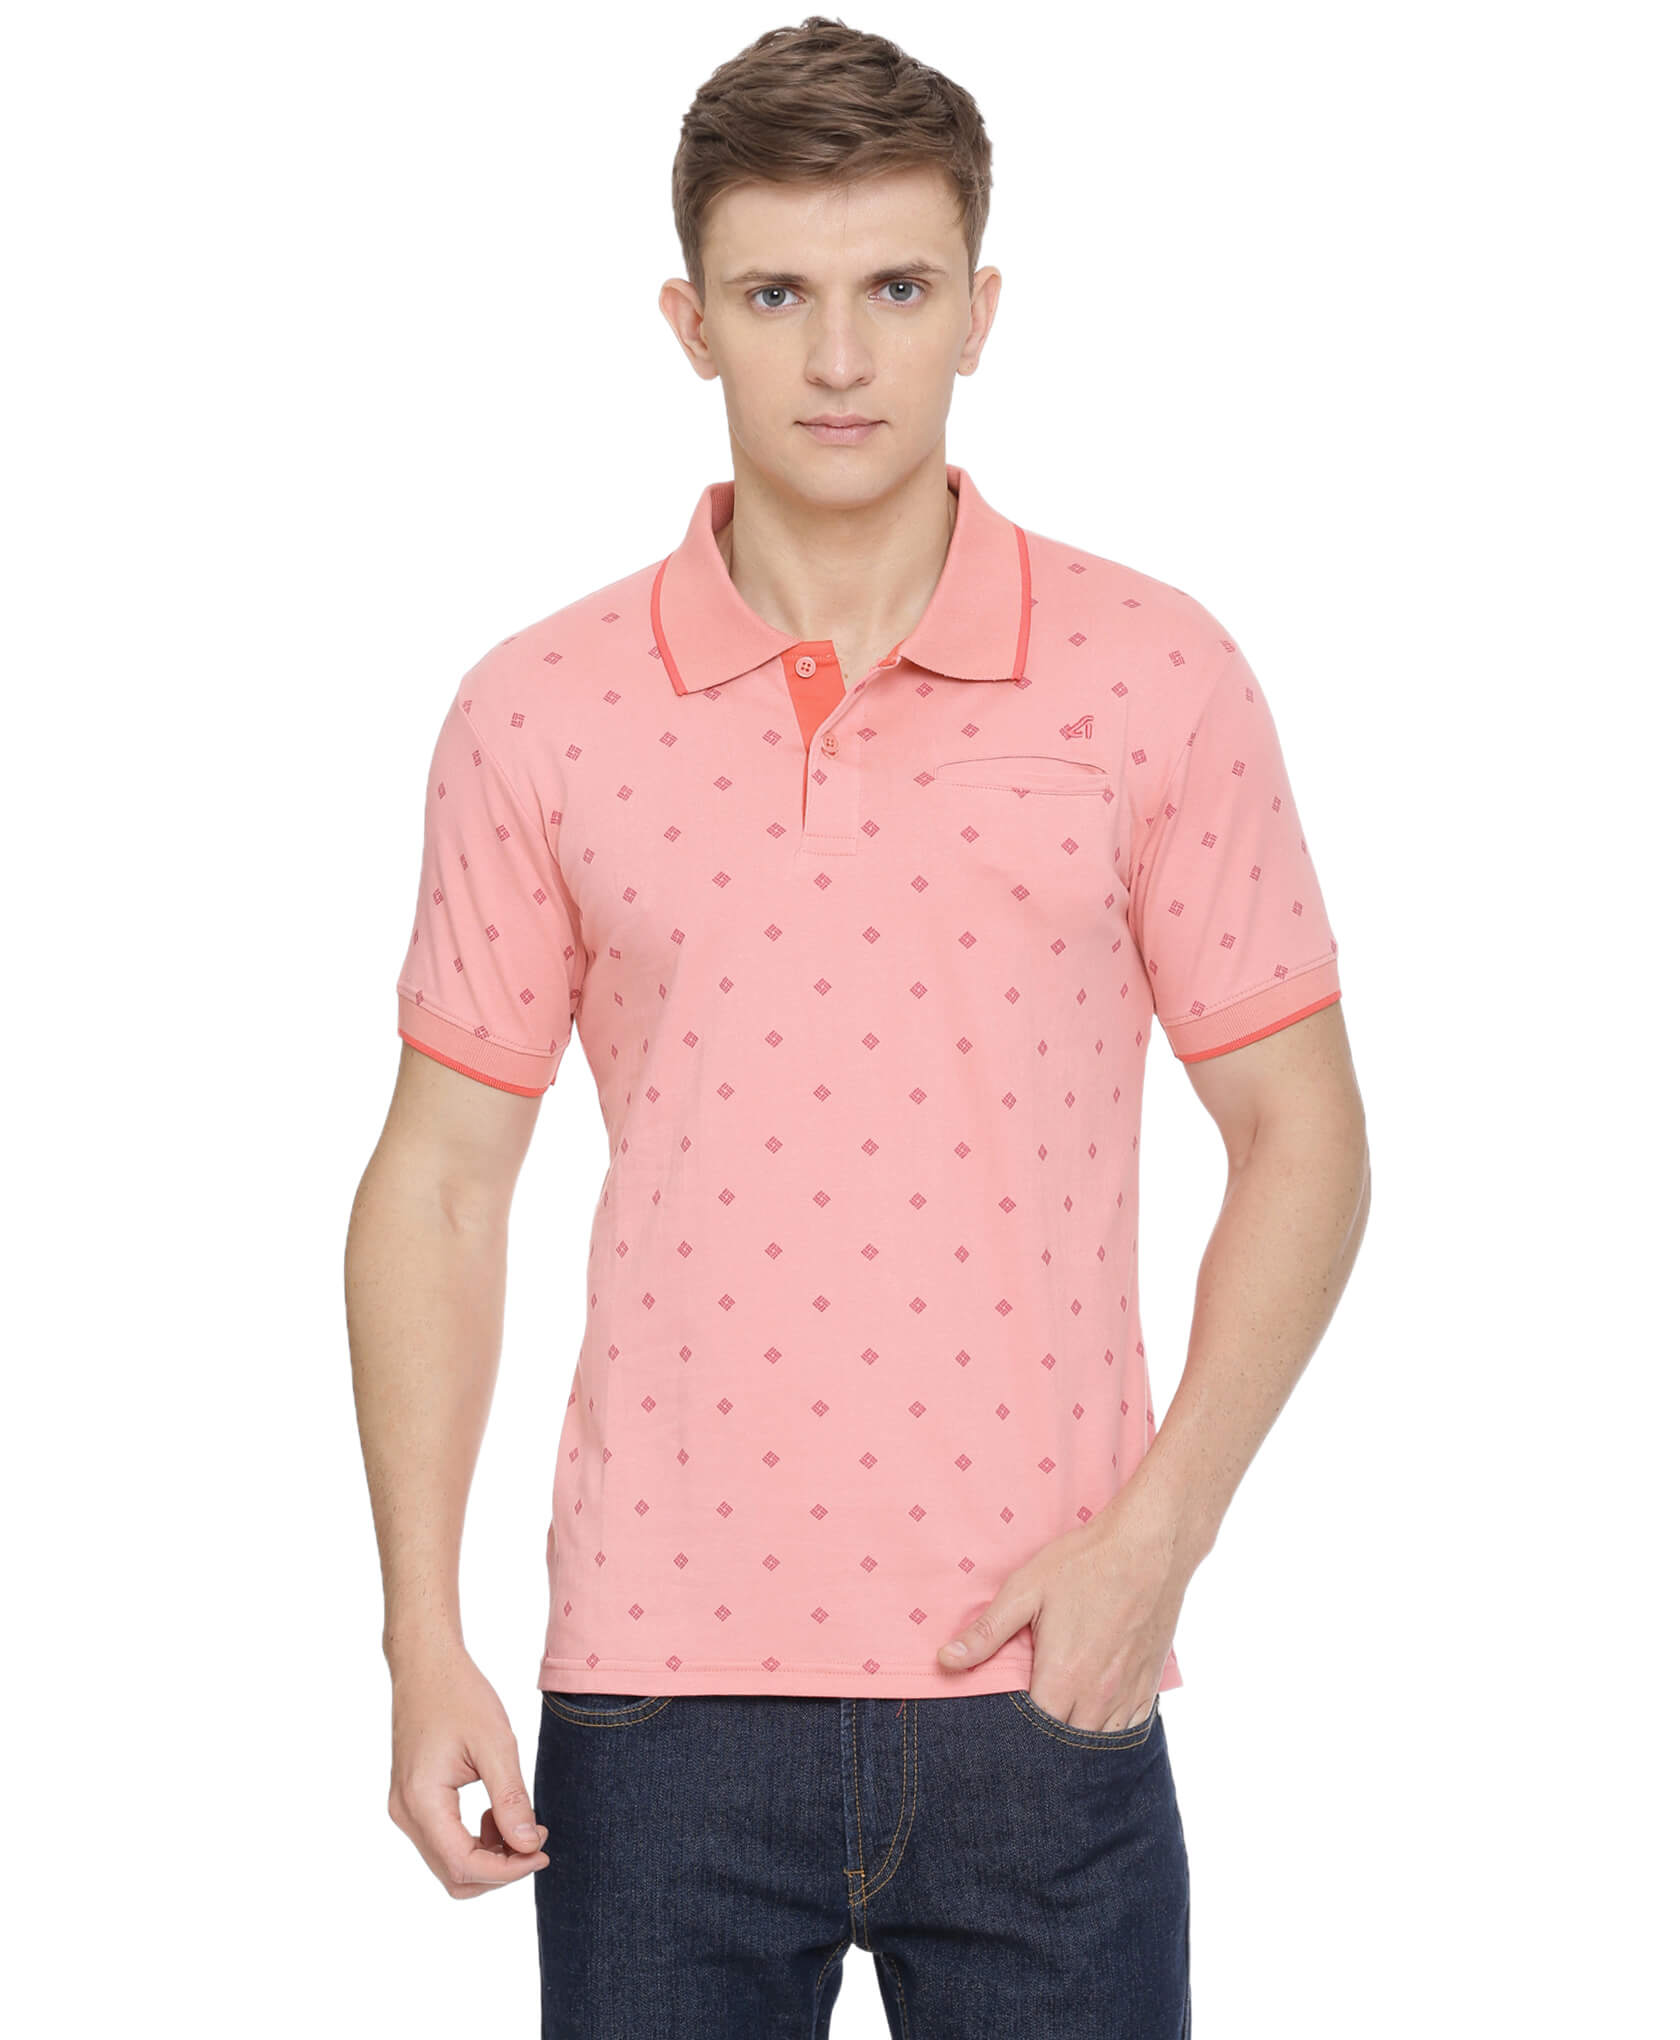 ATIVO Pink AOP Stretch Polo